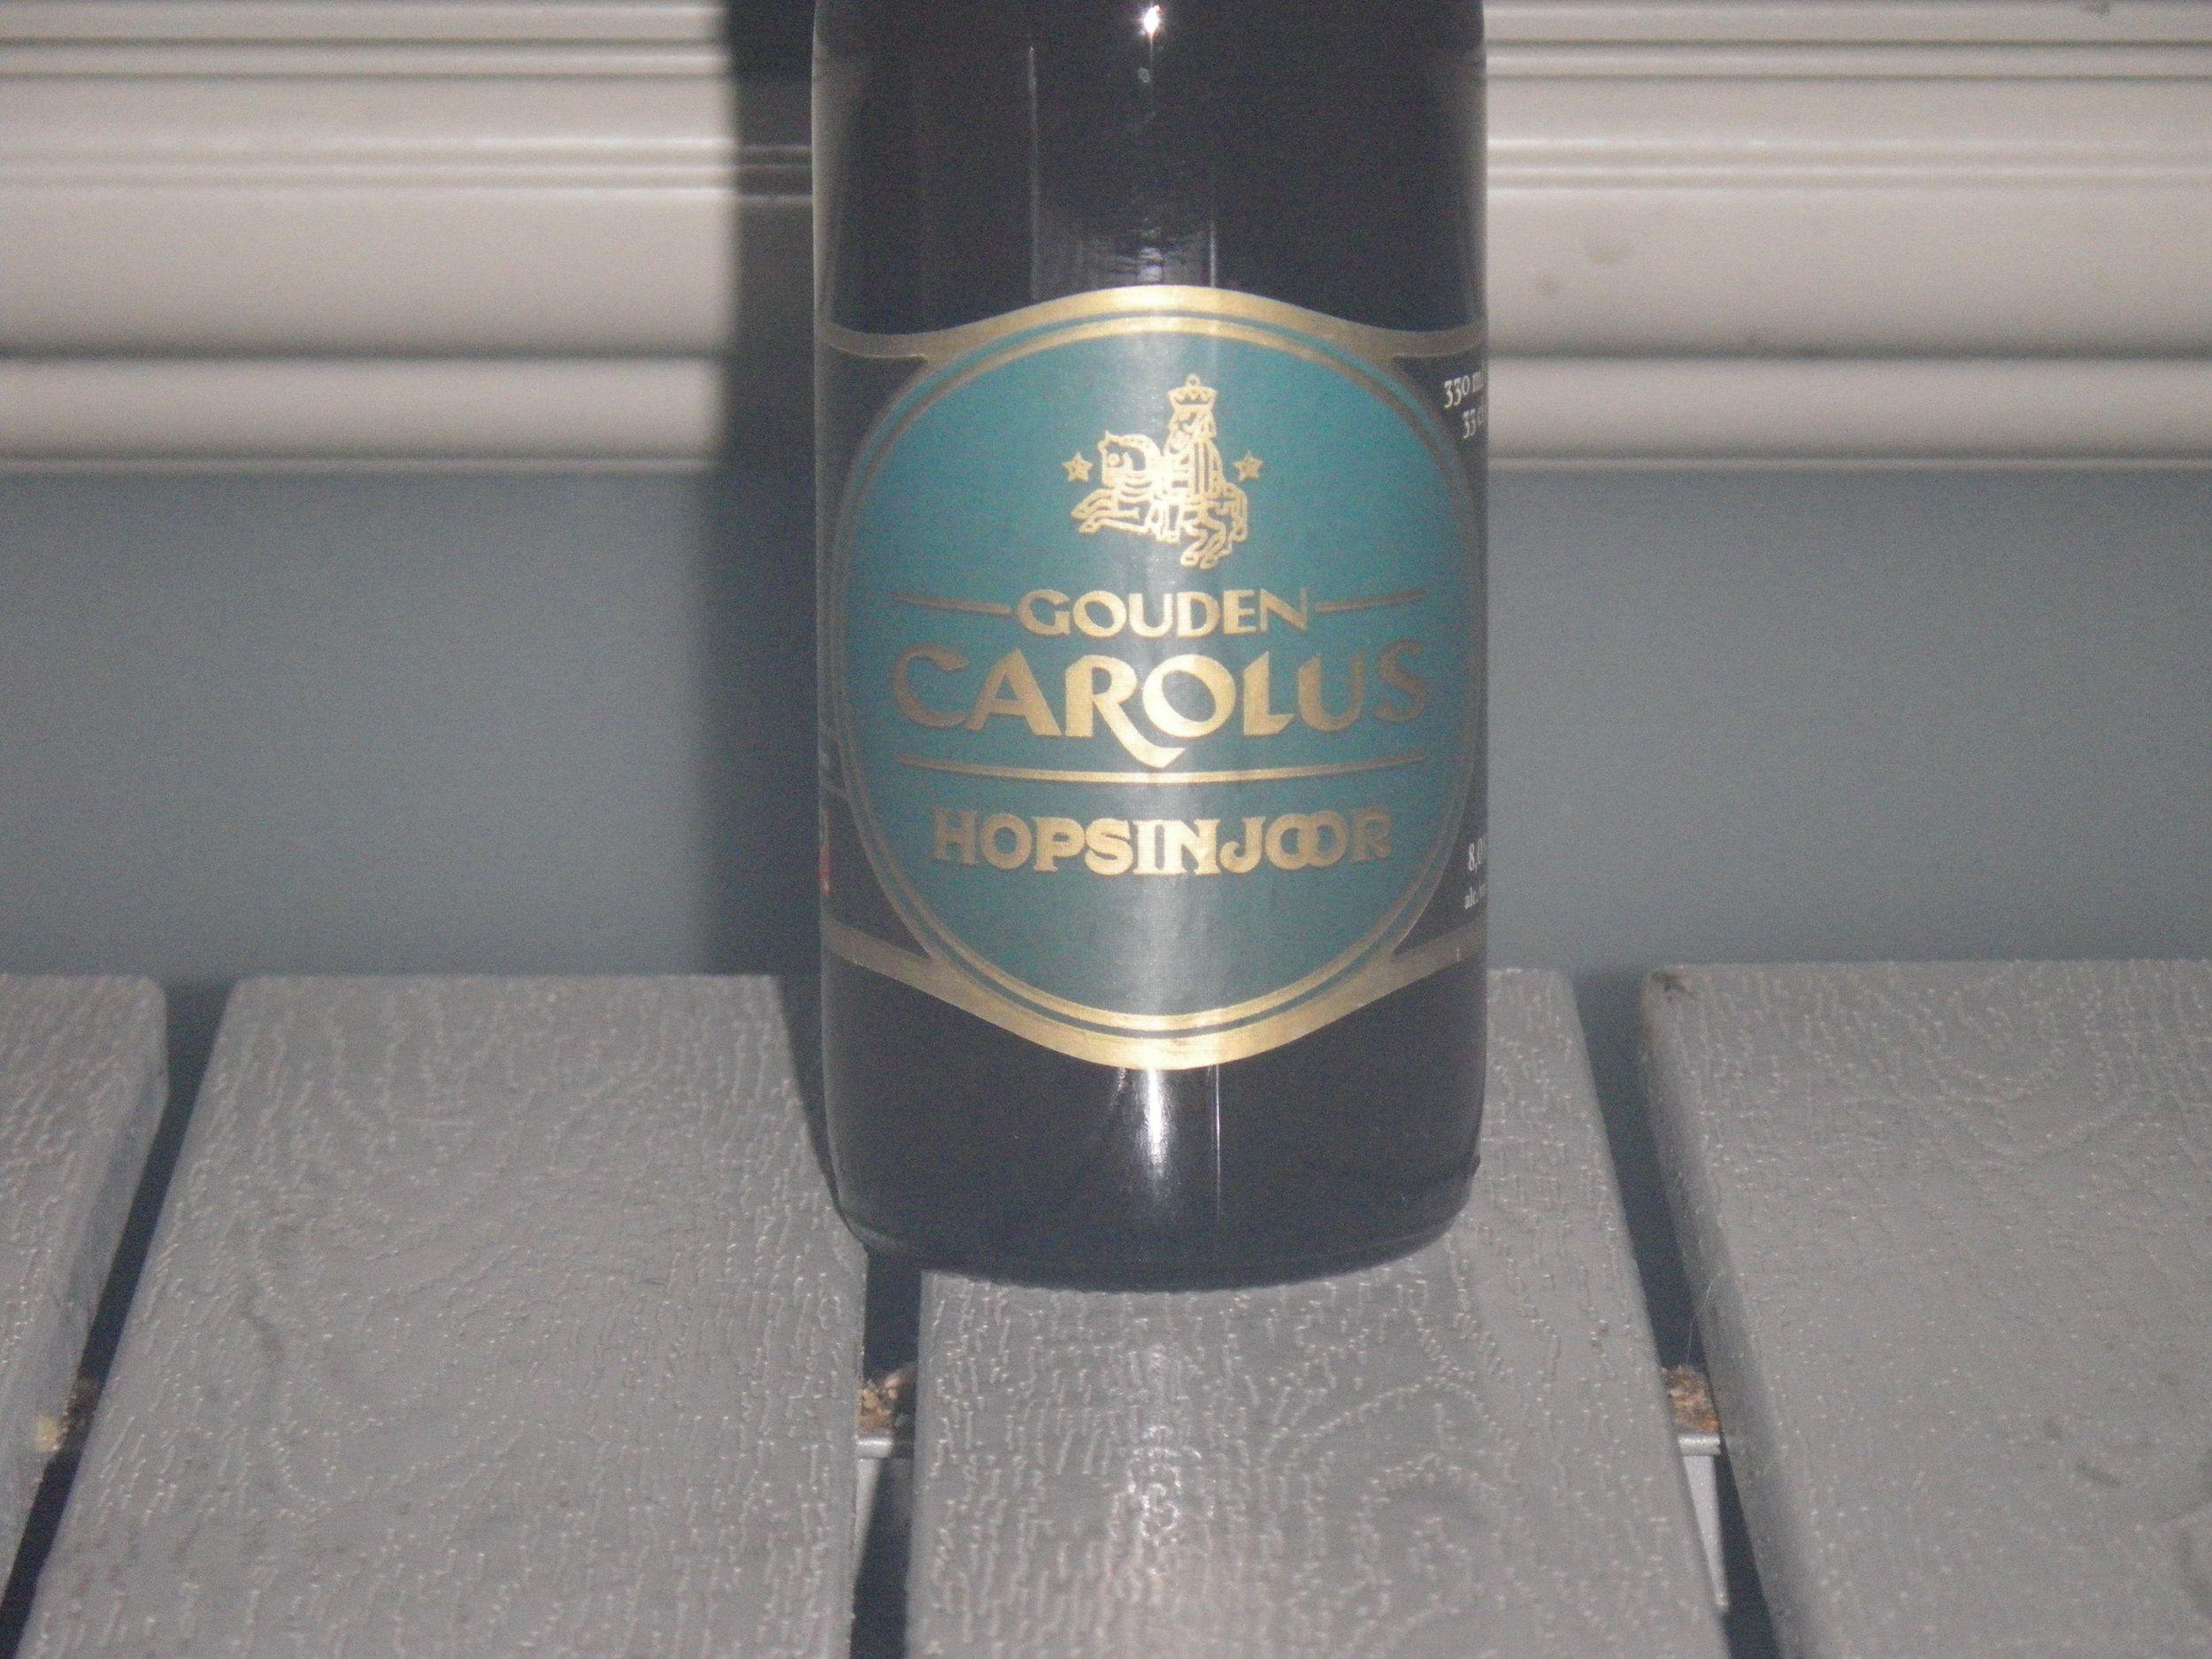 Gouden Carolus Hopsinjoor.JPG